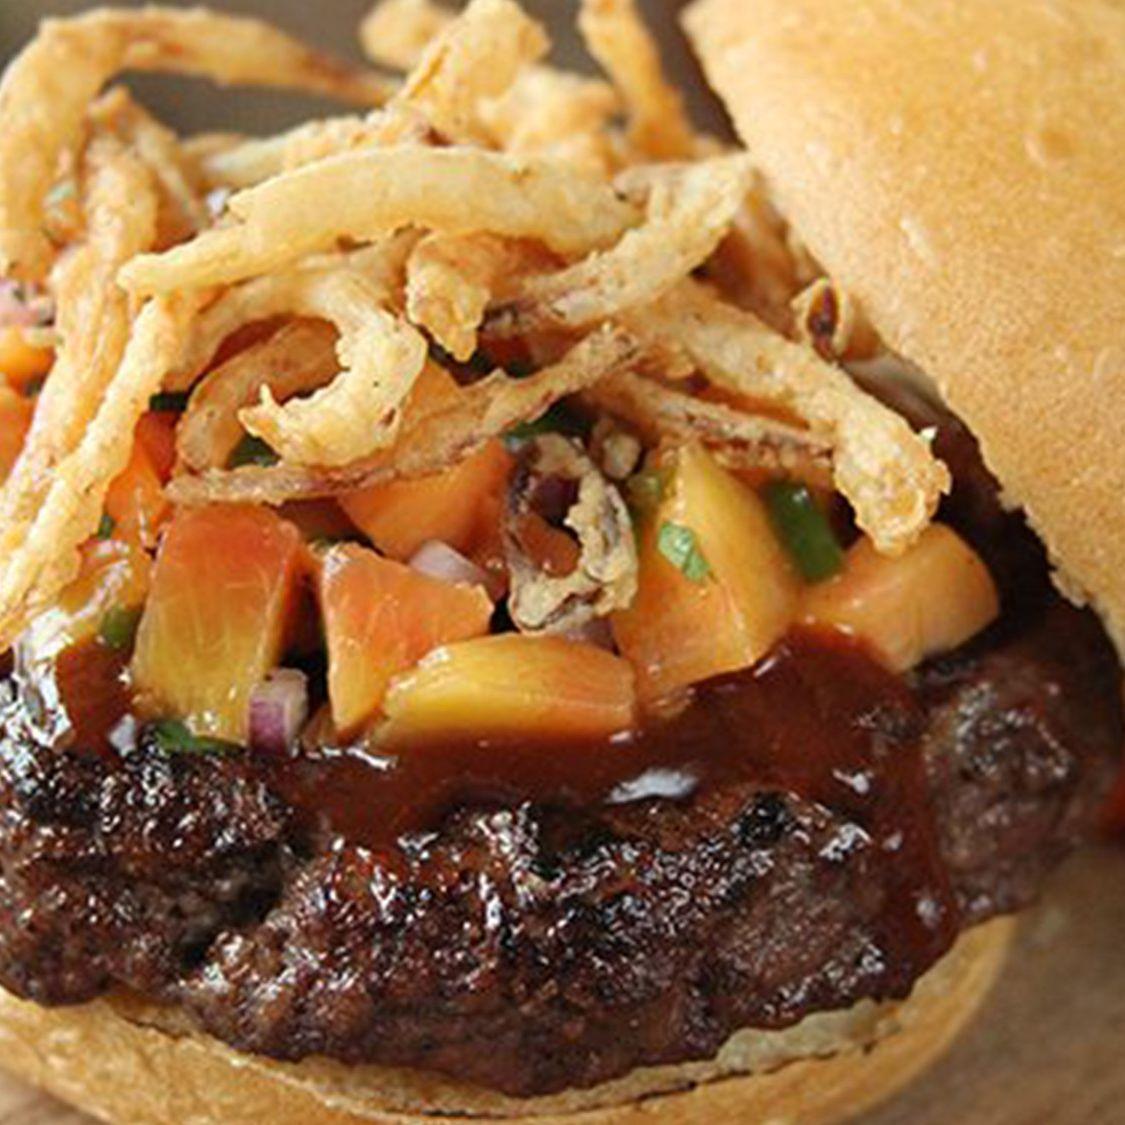 sticky_sweet_burger_with_peach_salsa.jpg